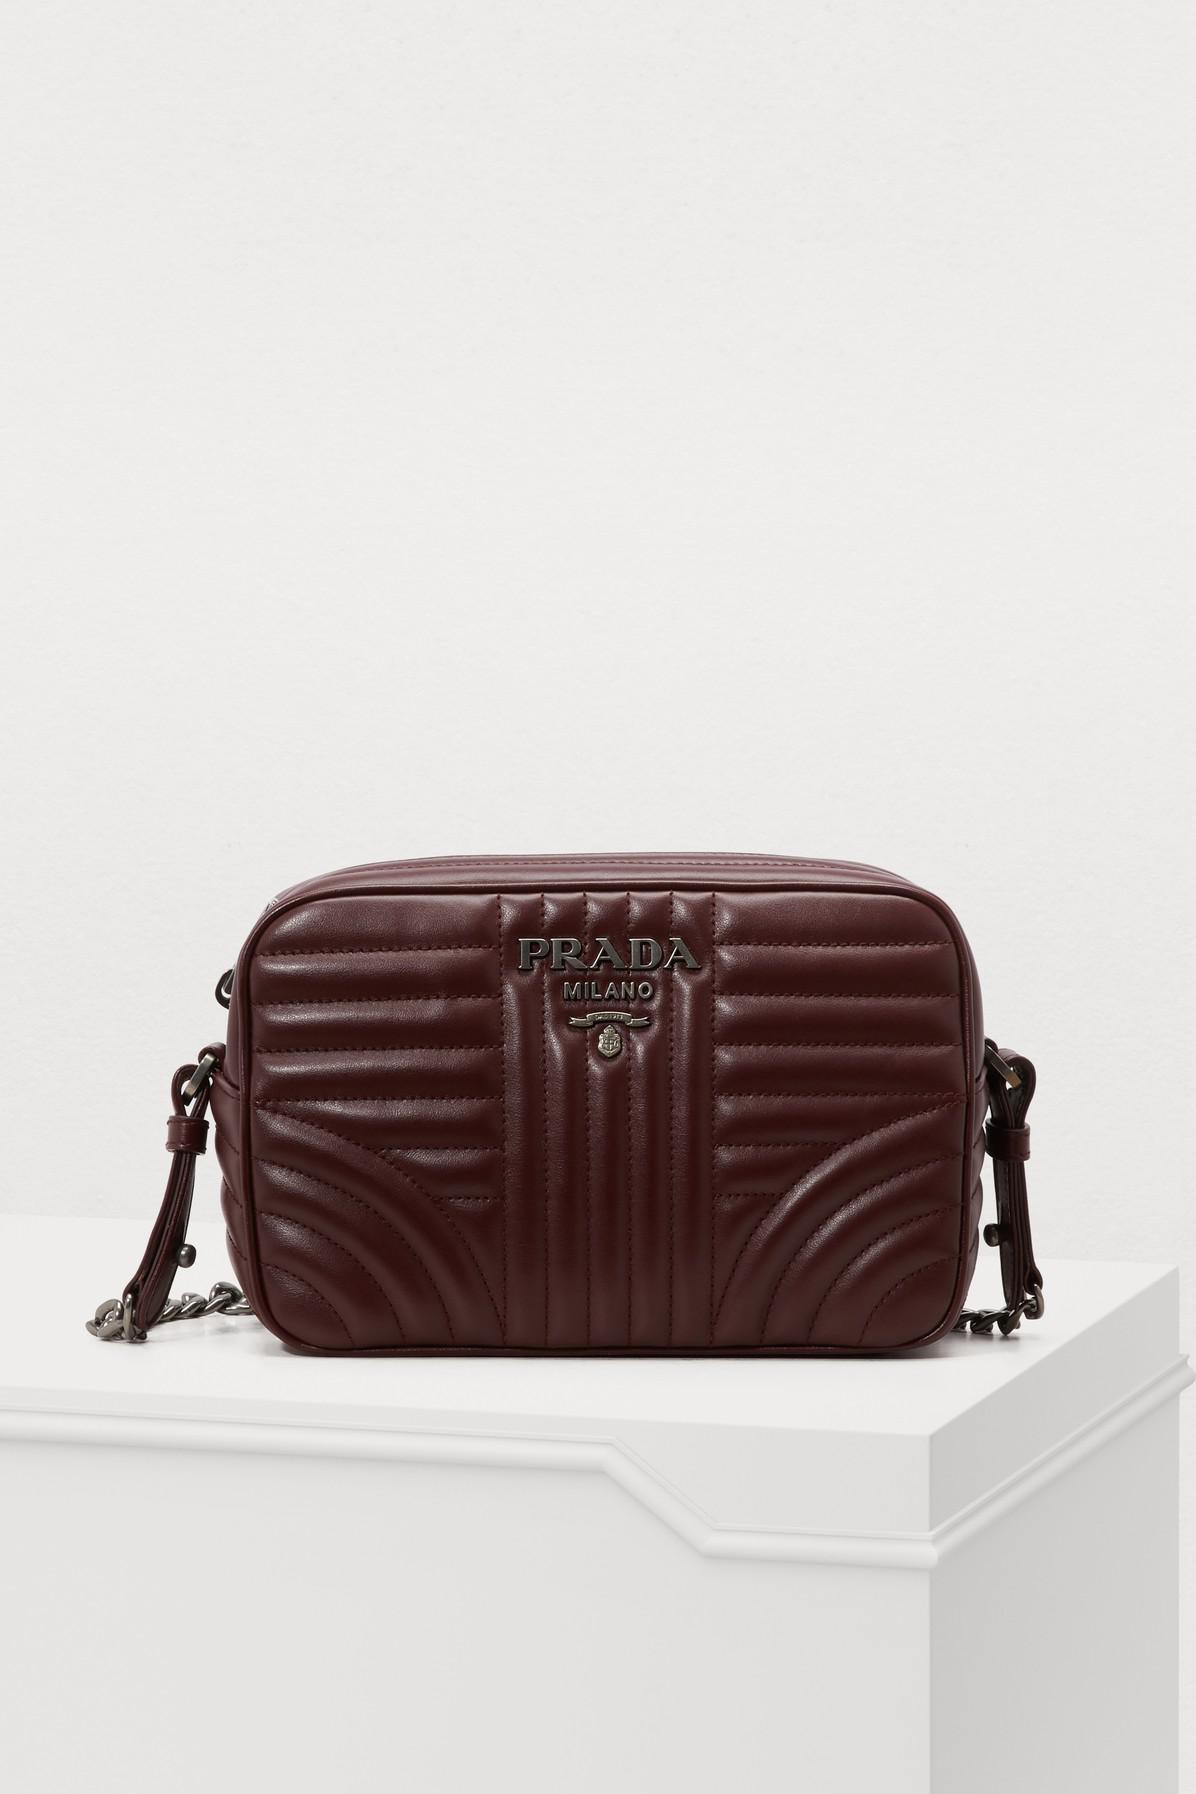 Prada - Brown Diagramme Caméra Shoulder Bag - Lyst. View fullscreen 976738d141071